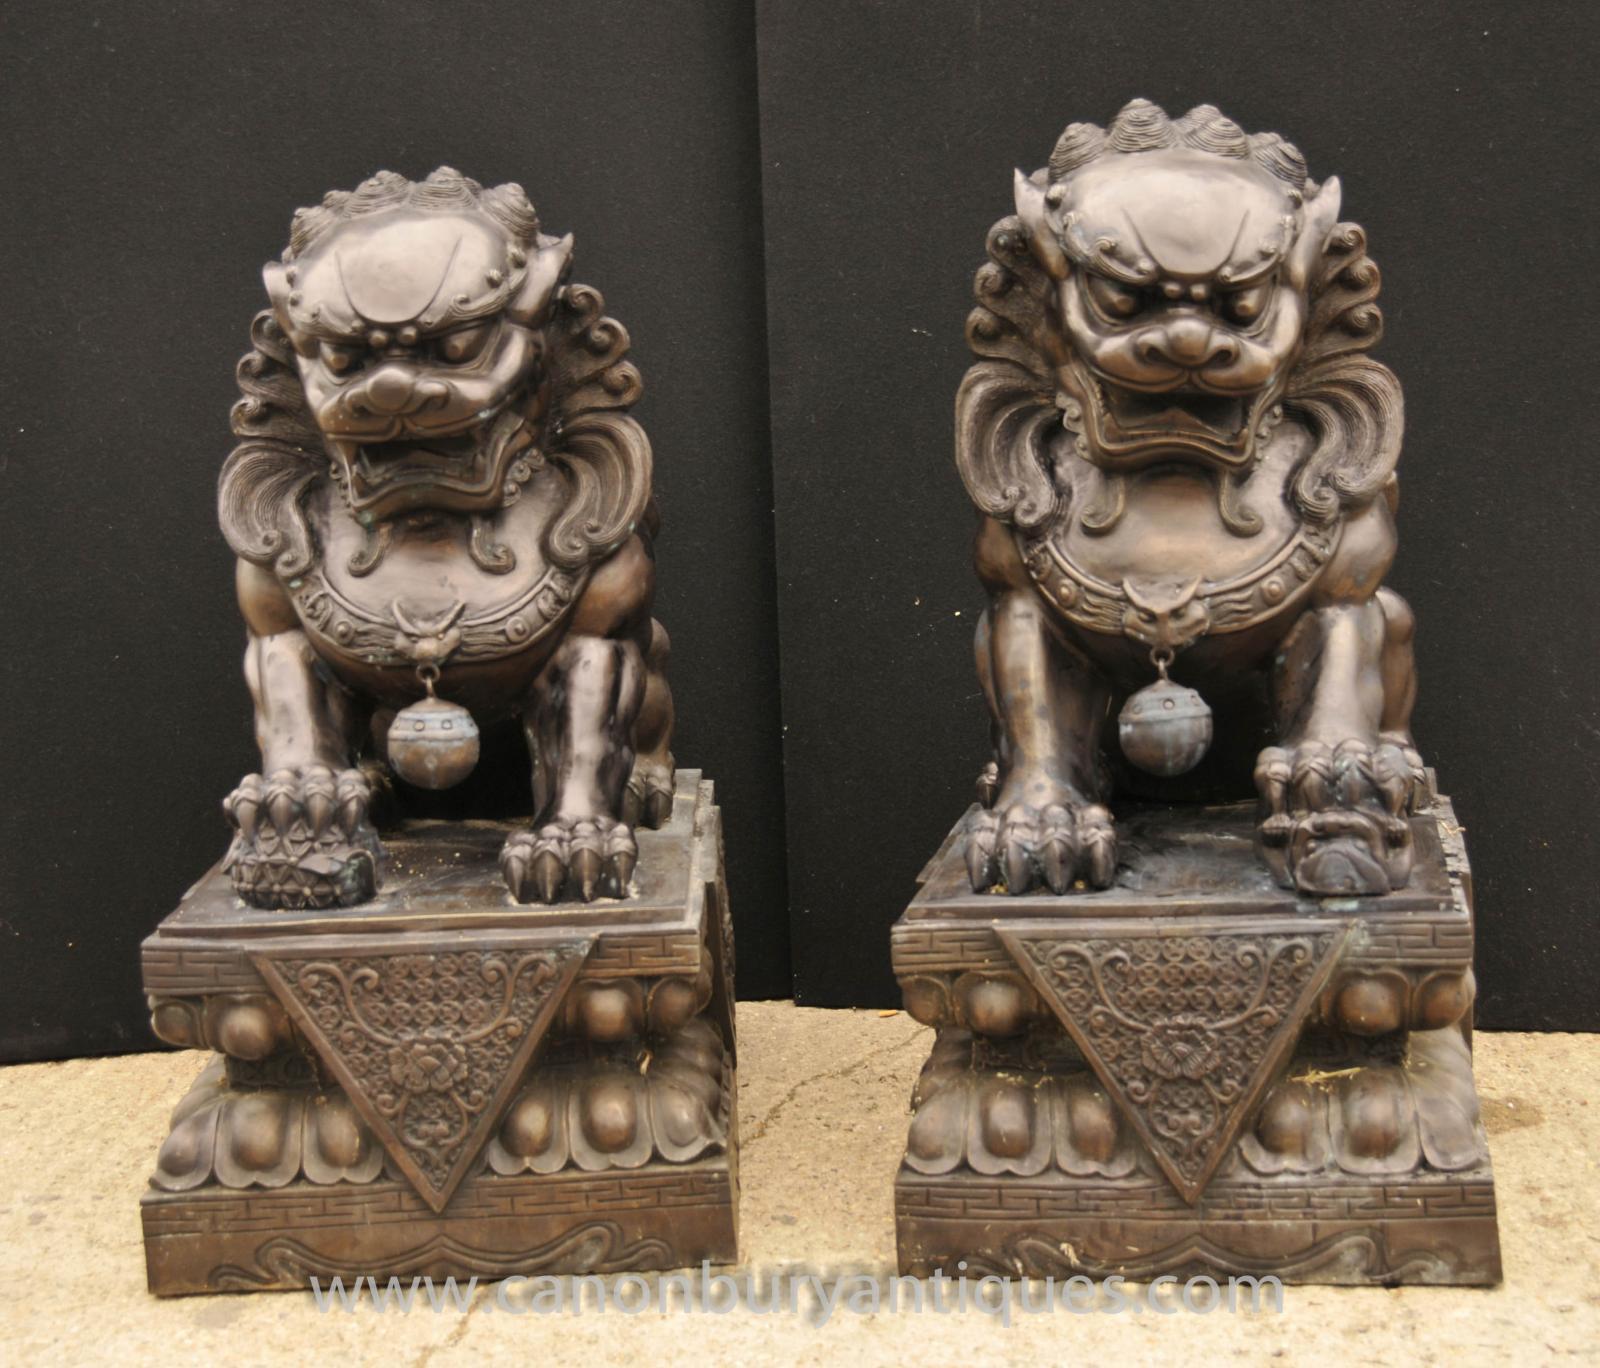 Foo dog statue temple - photo#3